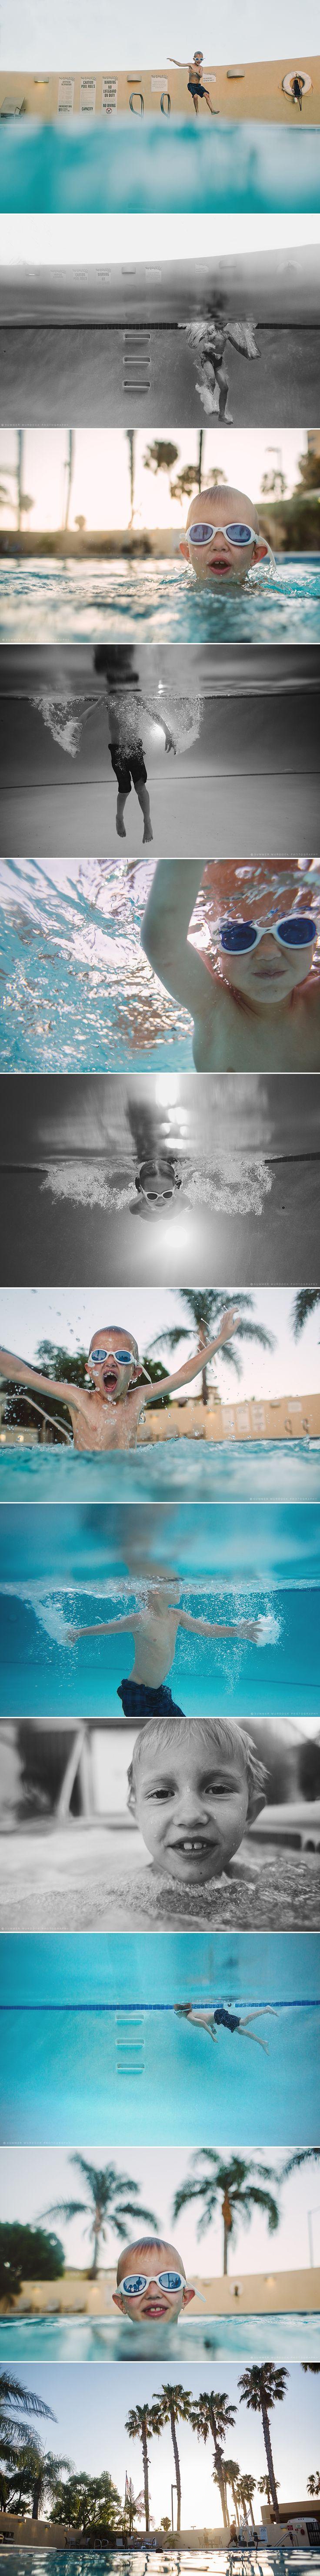 Summer Murdock Photography | Salt Lake City Photographer | Underwater Photograph...